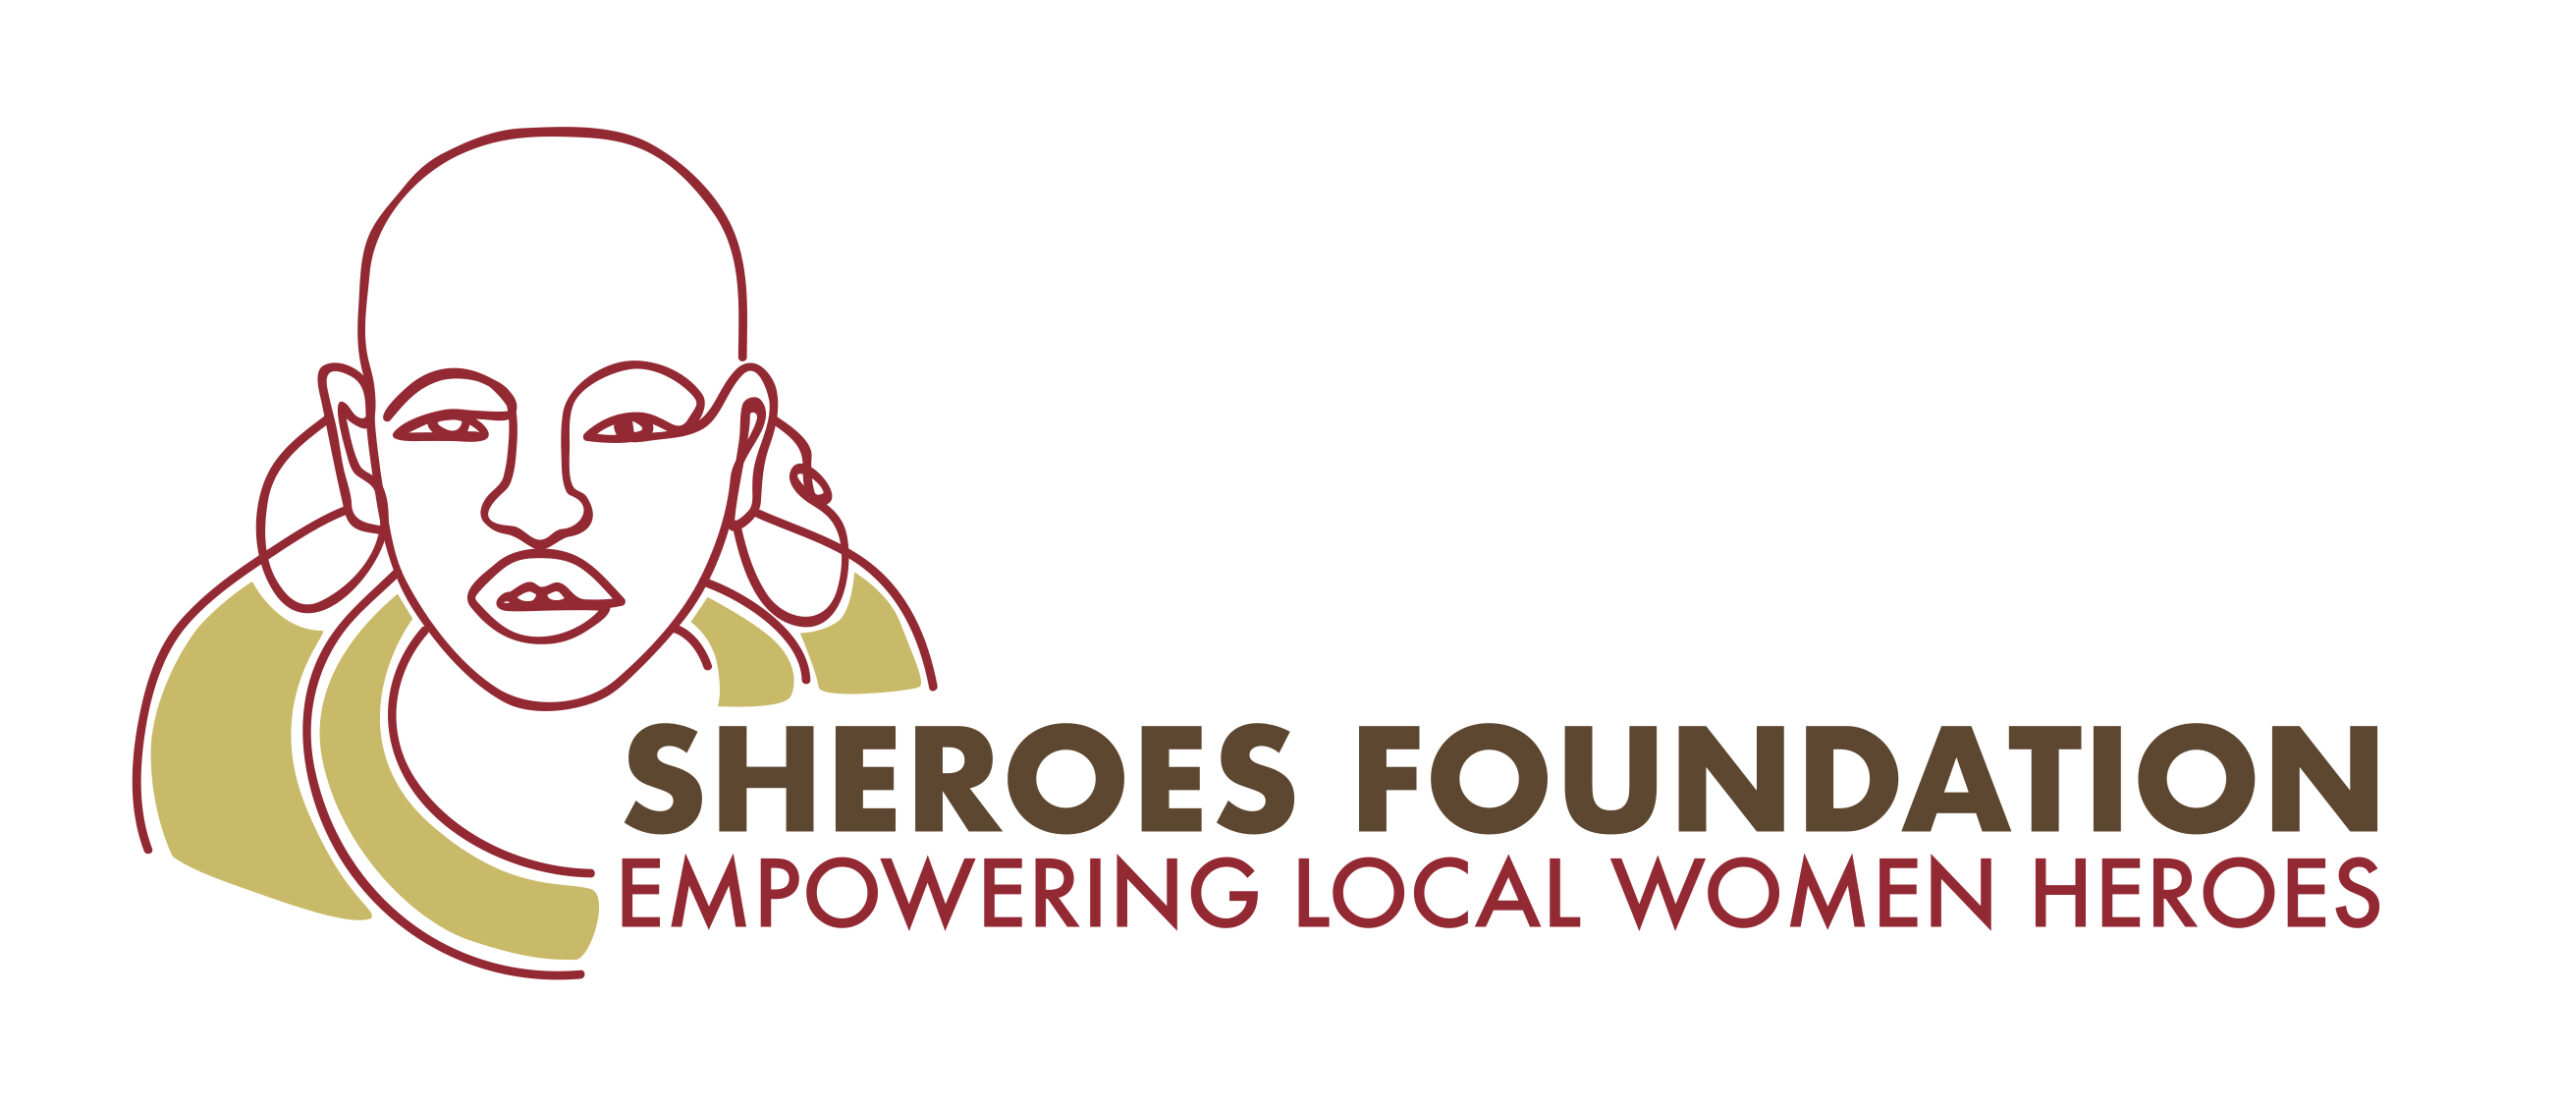 Sheroes Foundation